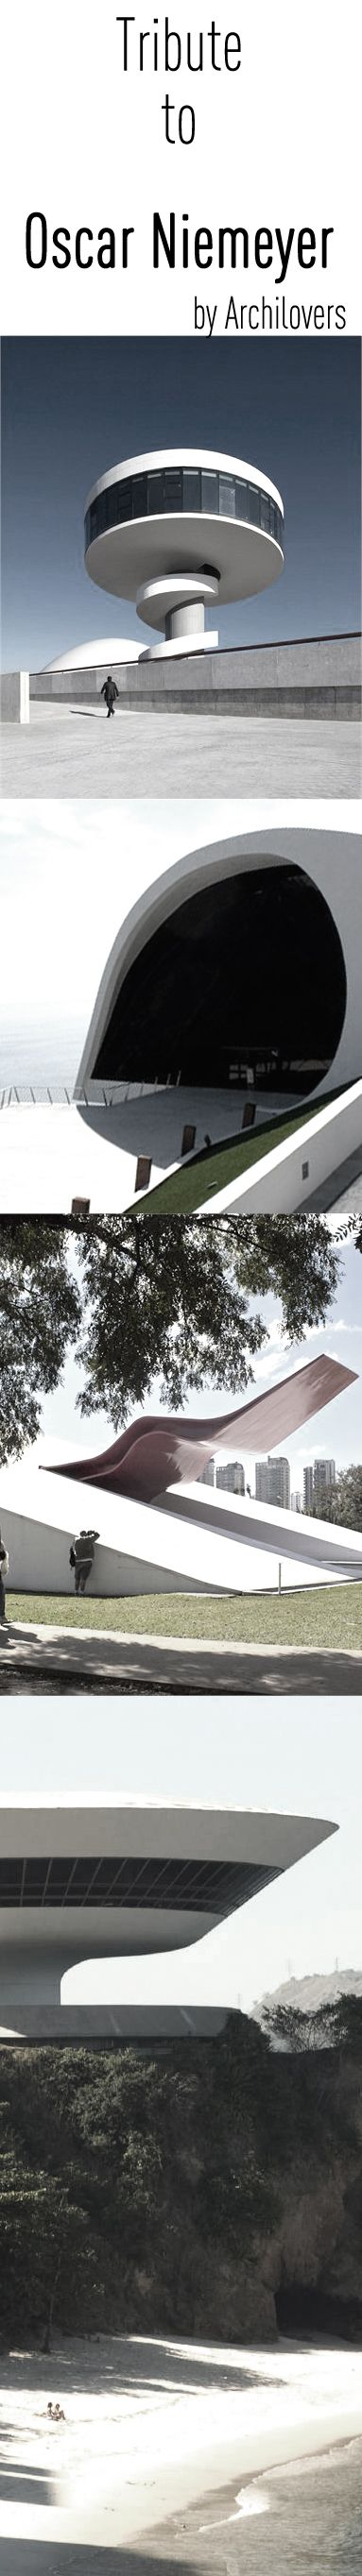 Tribute to Oscar Niemeyer - Can't wait to see Brasilia